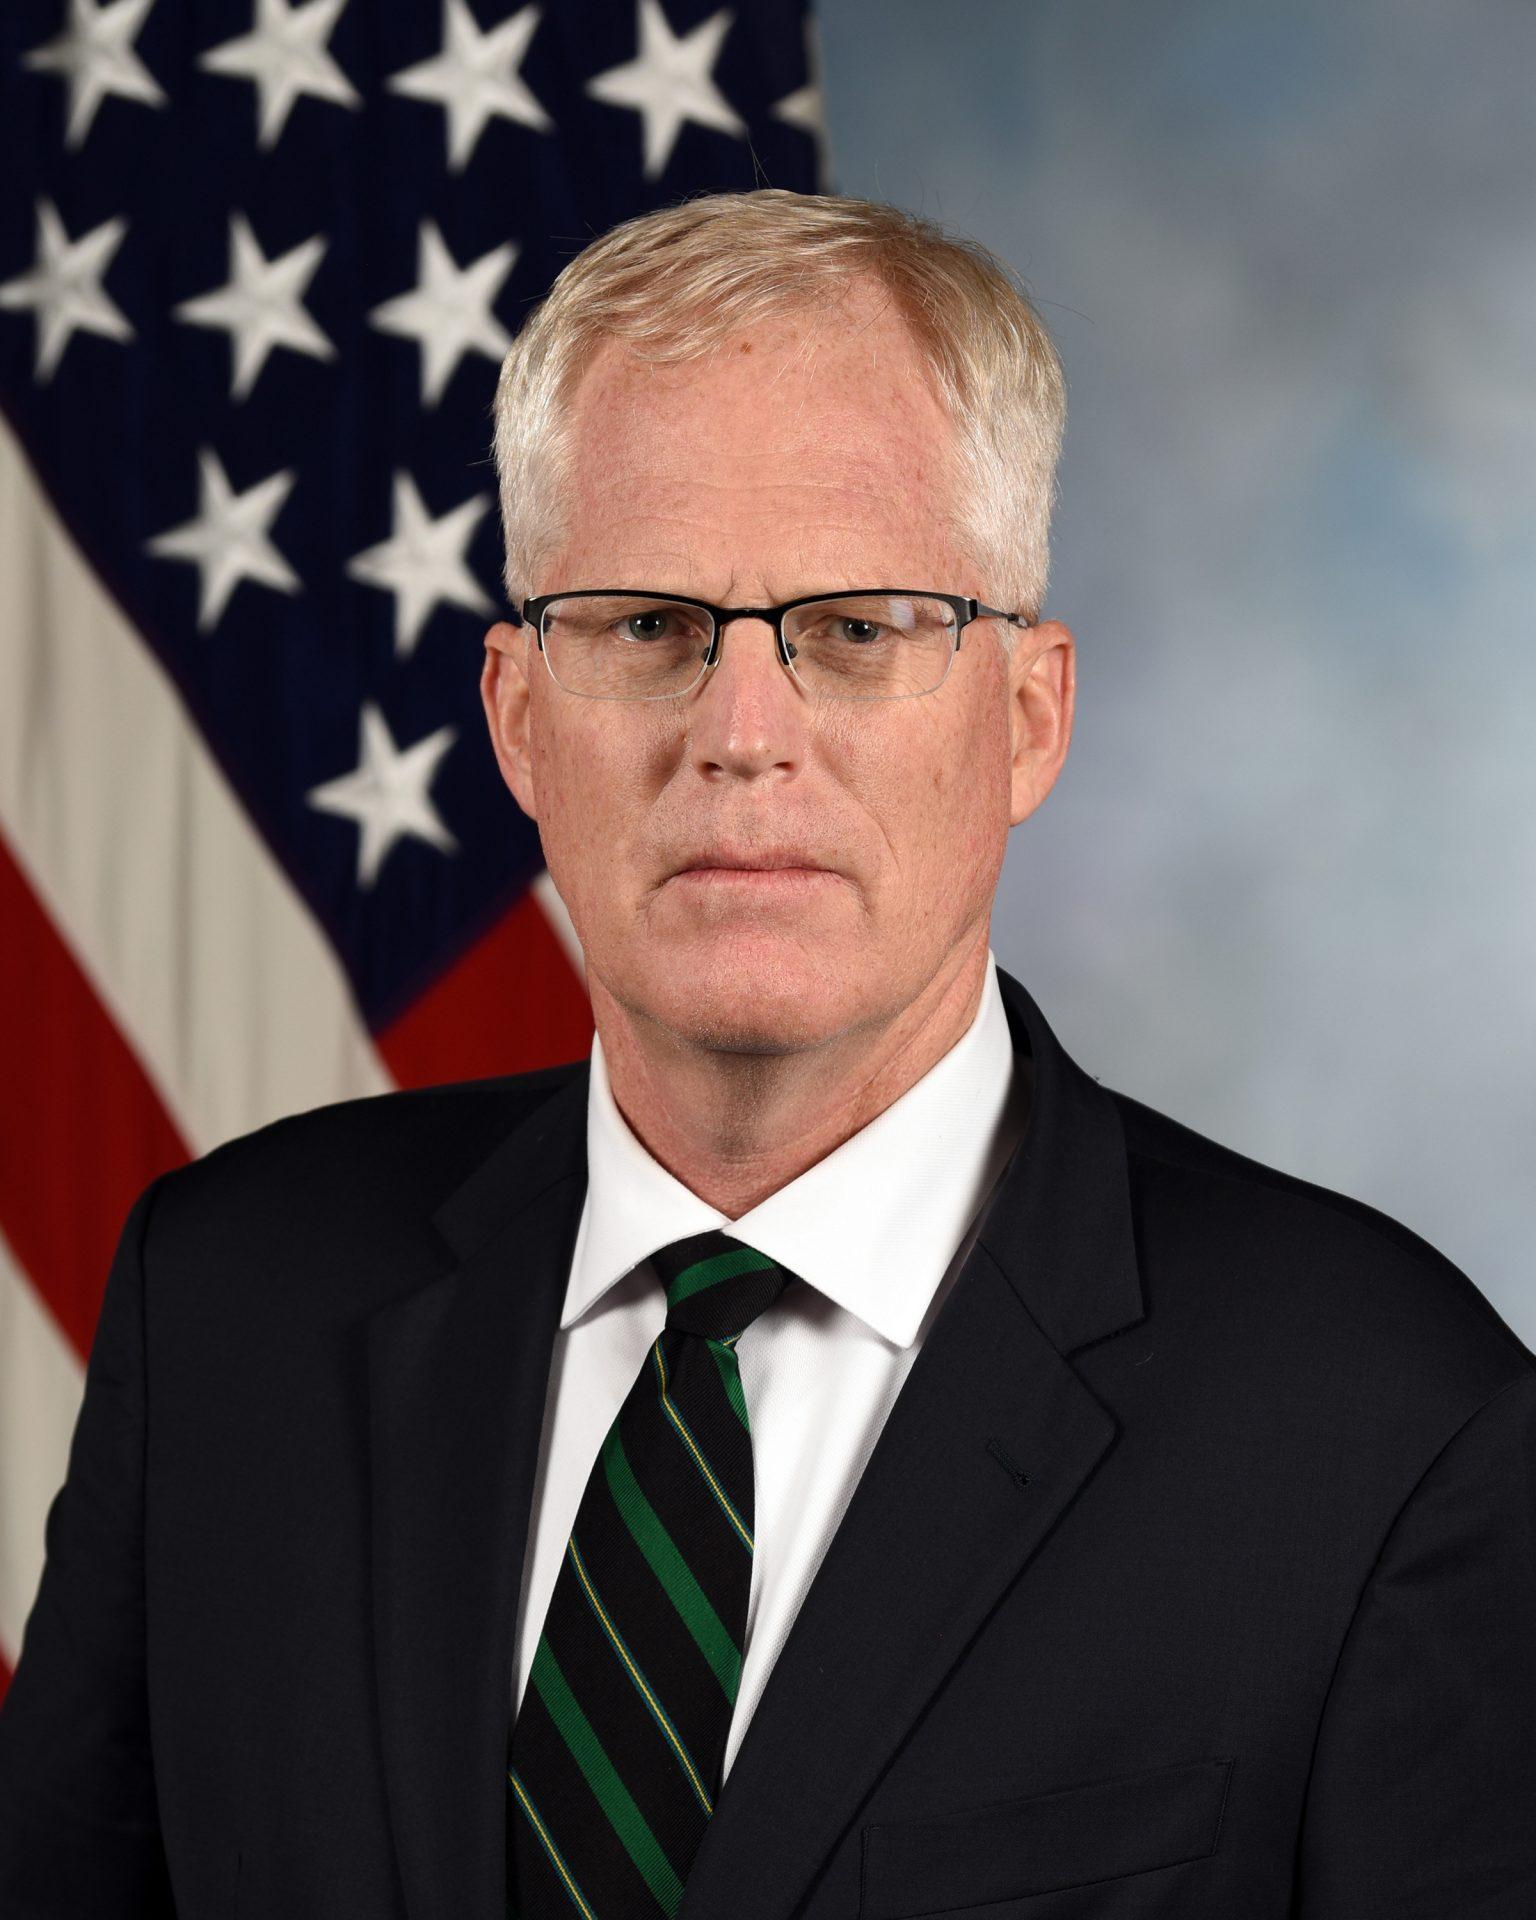 Acting Secretary of Defense Christopher C. Miller, official portrait. (Image: Department of Defense)